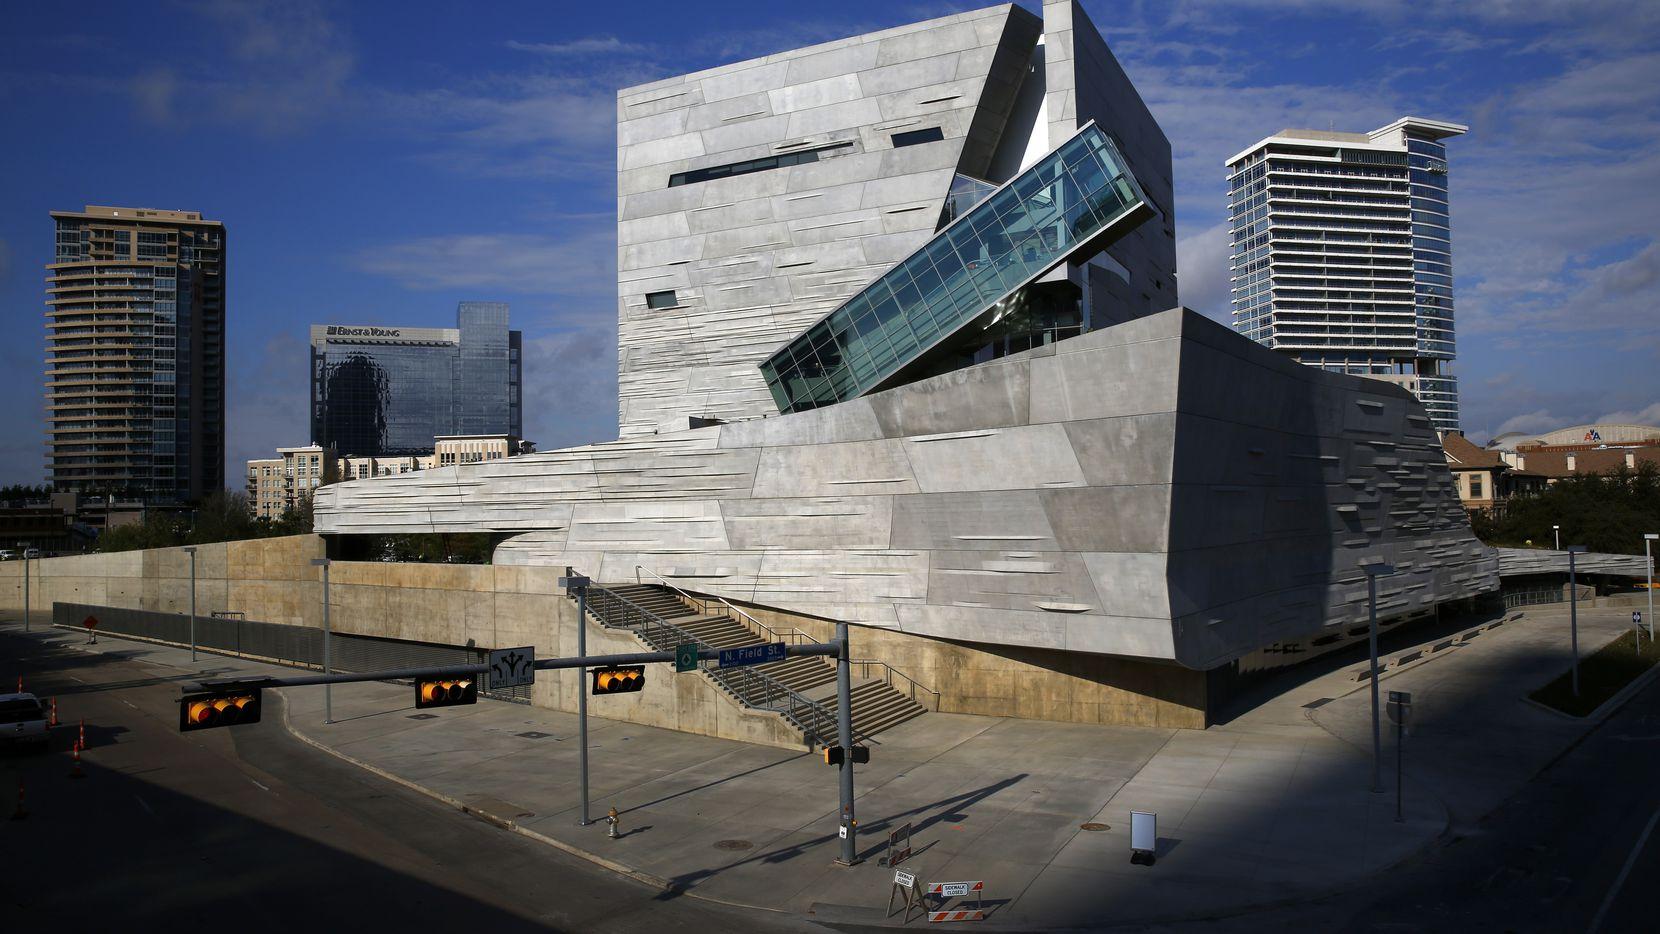 Vista exterior del Perot Museum of Nature and Science de Dallas.